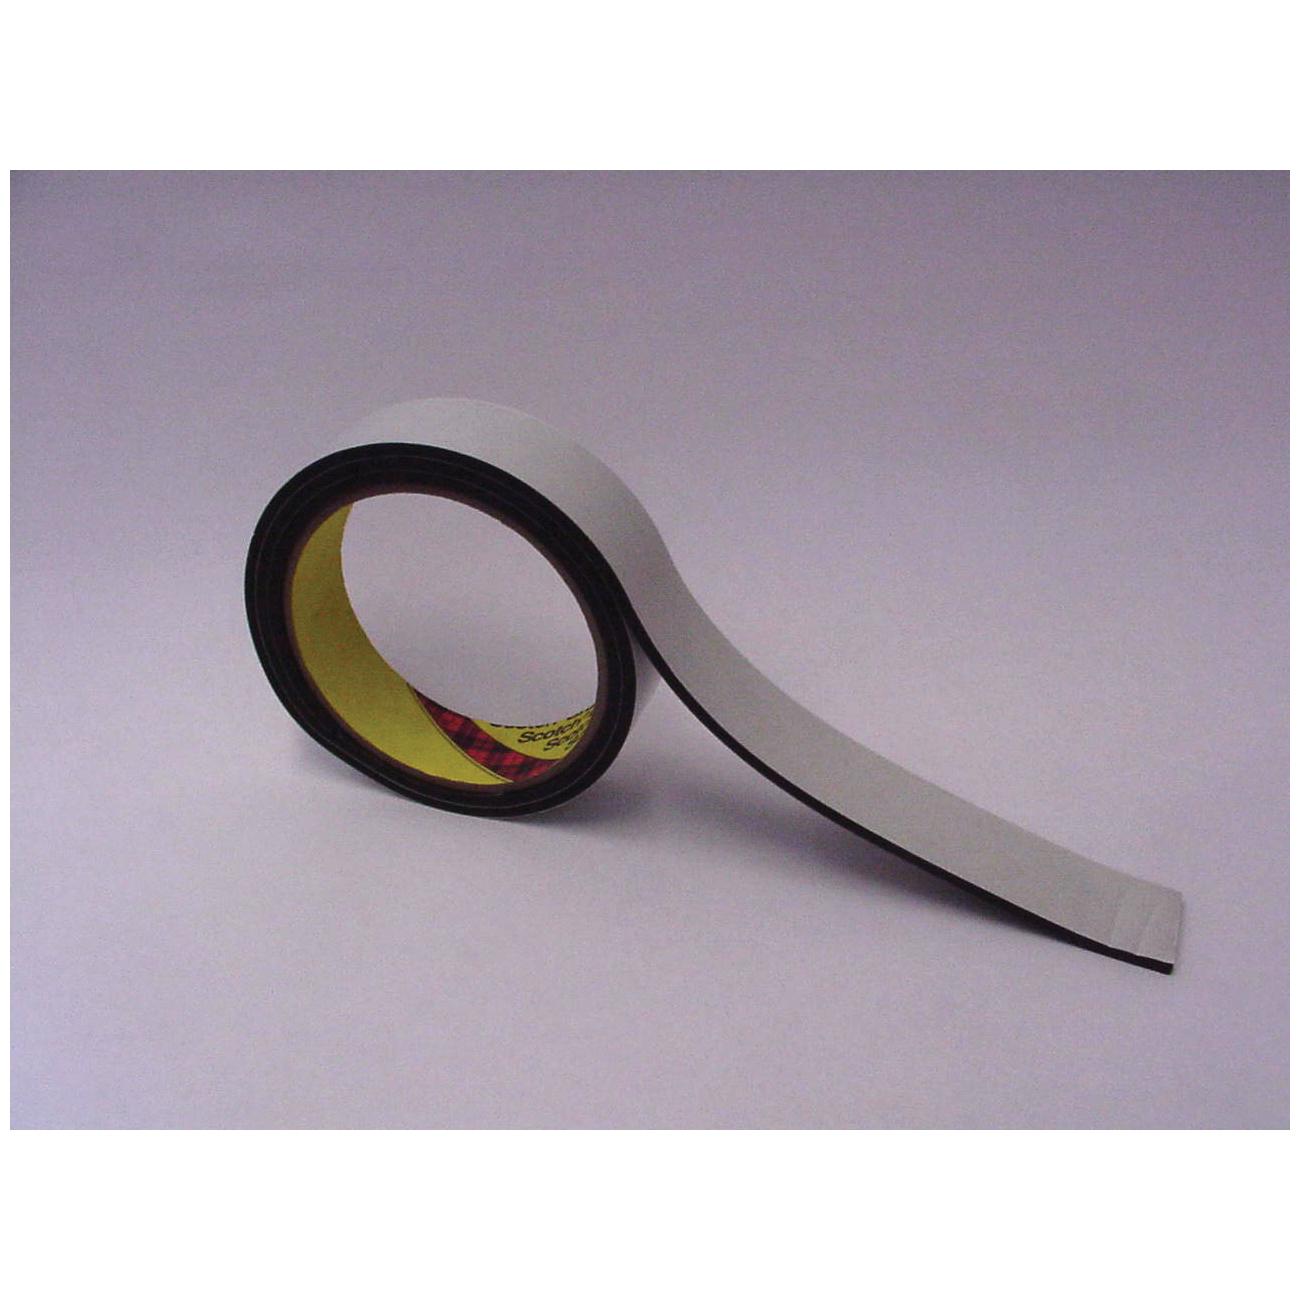 3M™ 021200-03310 Single Coated Foam Tape, 36 yd L x 1/4 in W, 125 mil THK, Acrylic Adhesive, Vinyl Foam Backing, Black